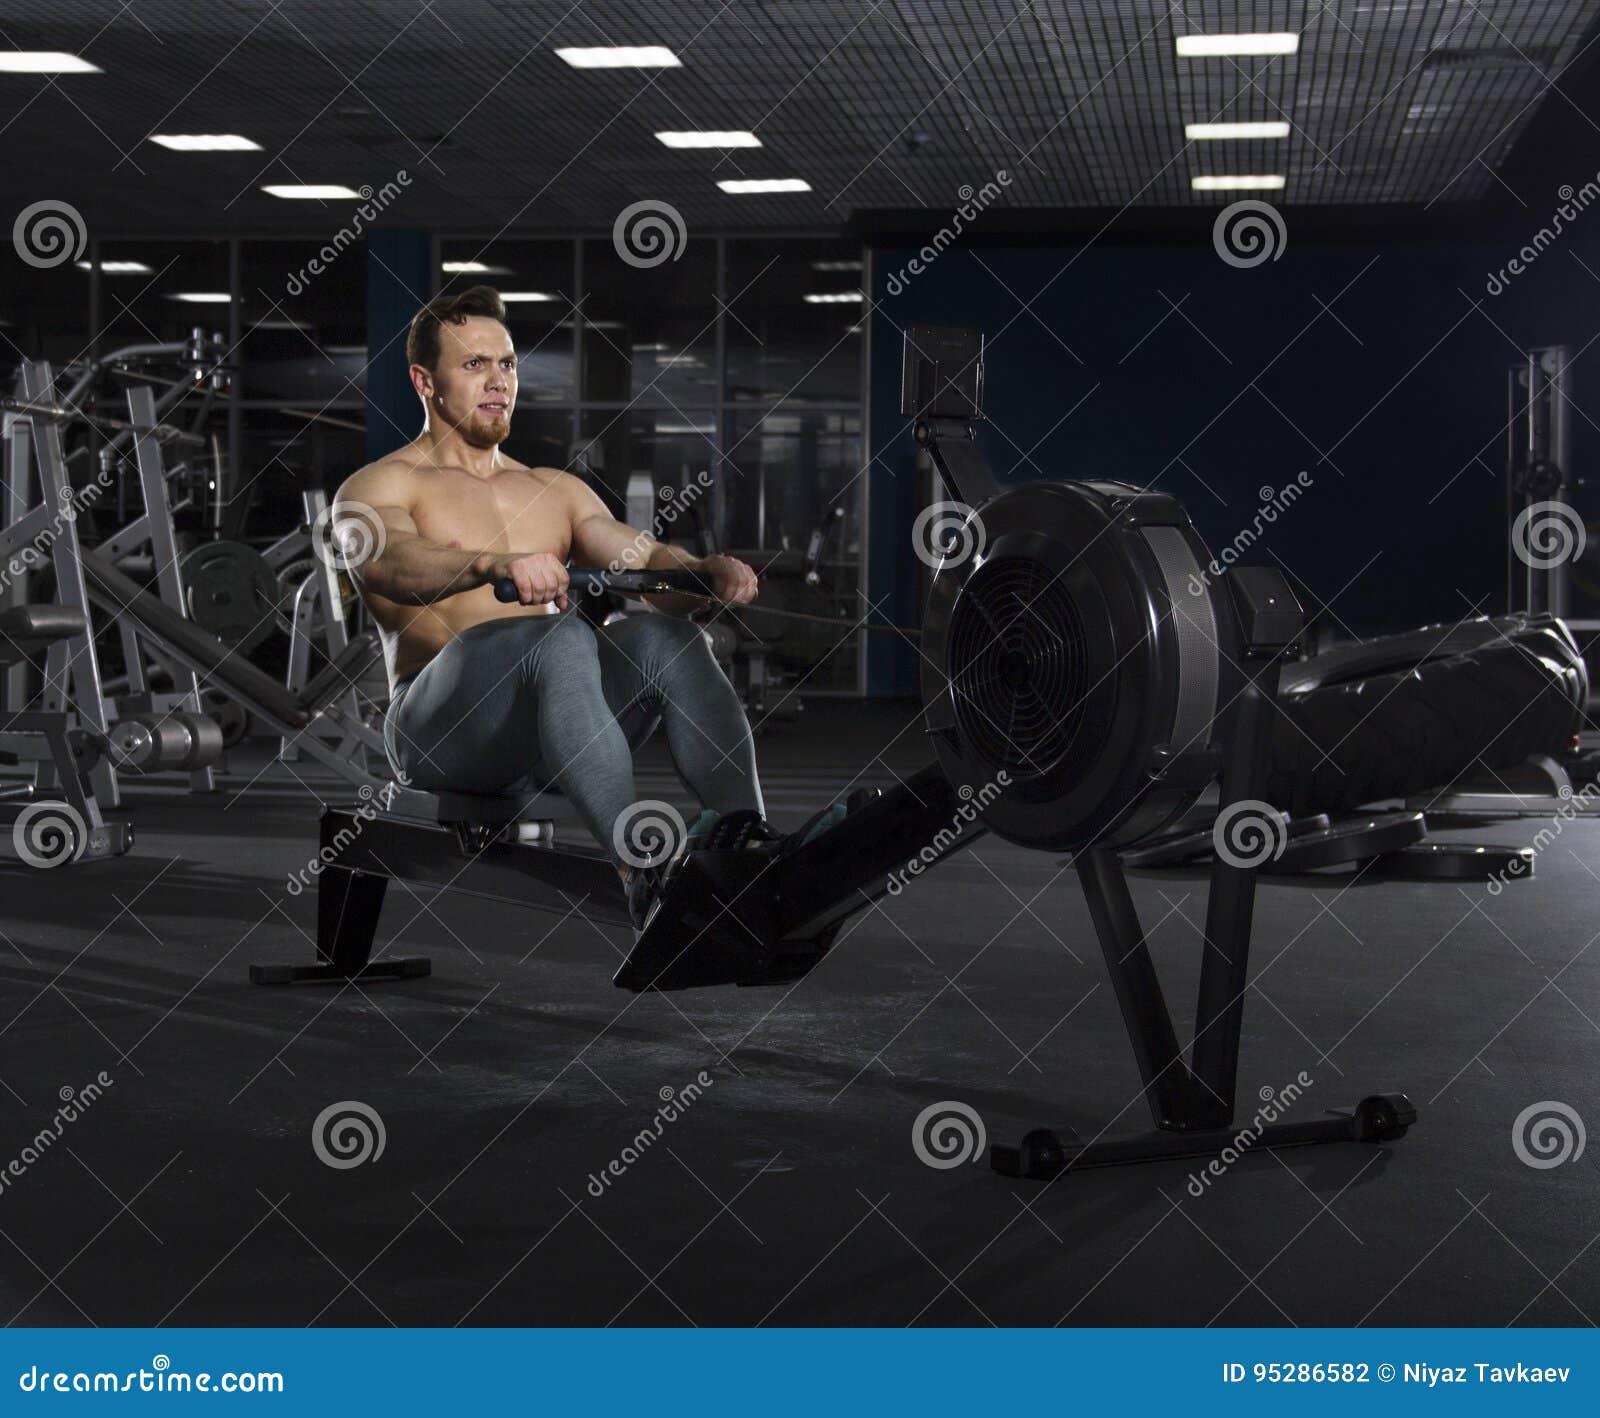 Portrait of muscular athlete working on rowing machine in modern